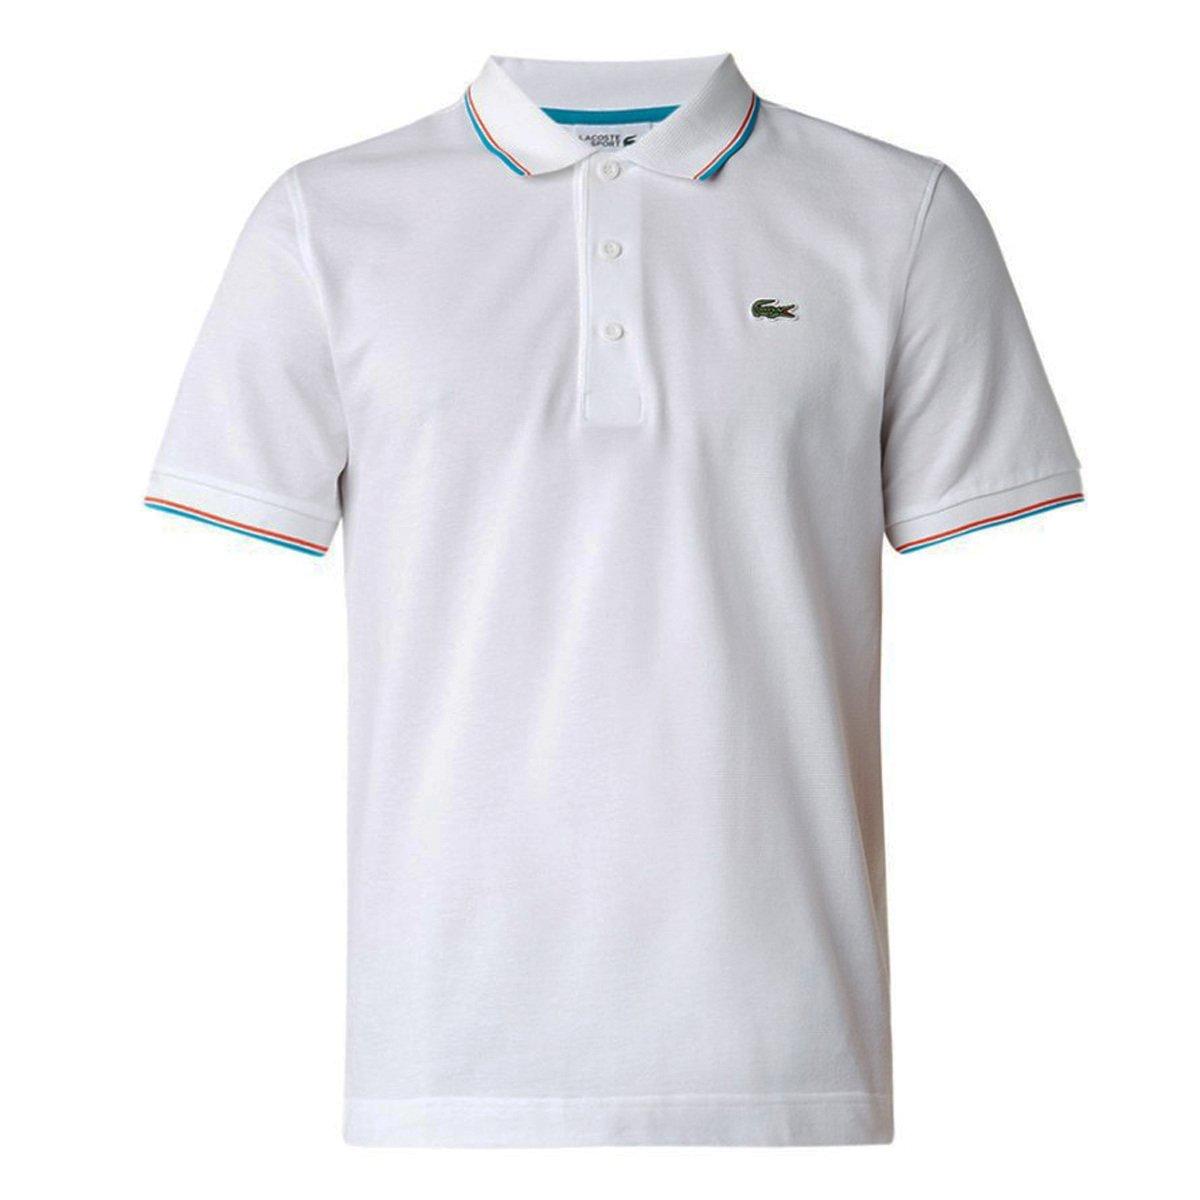 8c3b6f2b5a Camisa Lacoste Polo Yh790021 Masculina